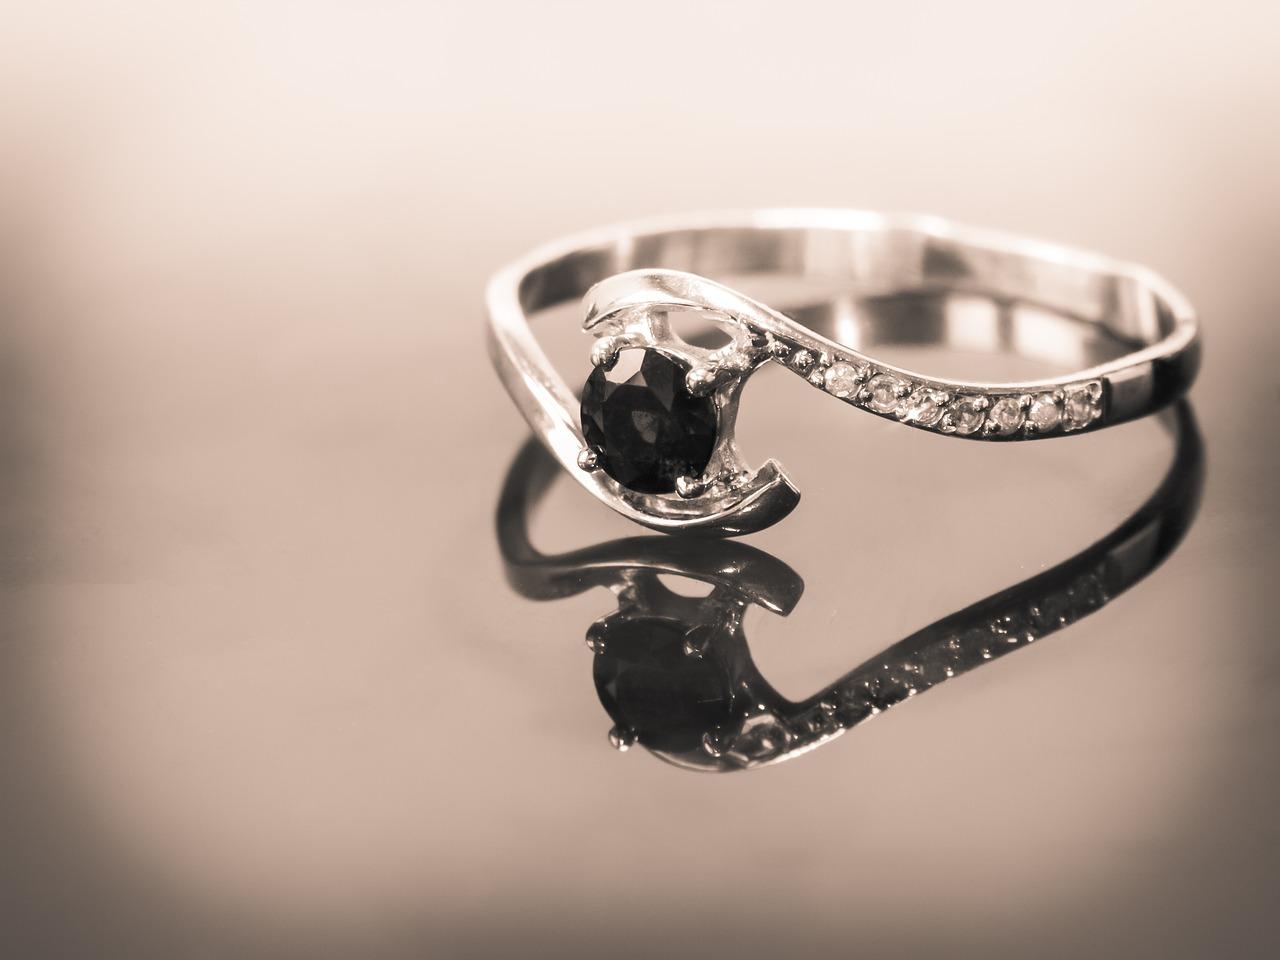 engagement ring 1546016700 - רכישת טבעות אירוסין – רק לאחר קבלת תעודה גמלונית